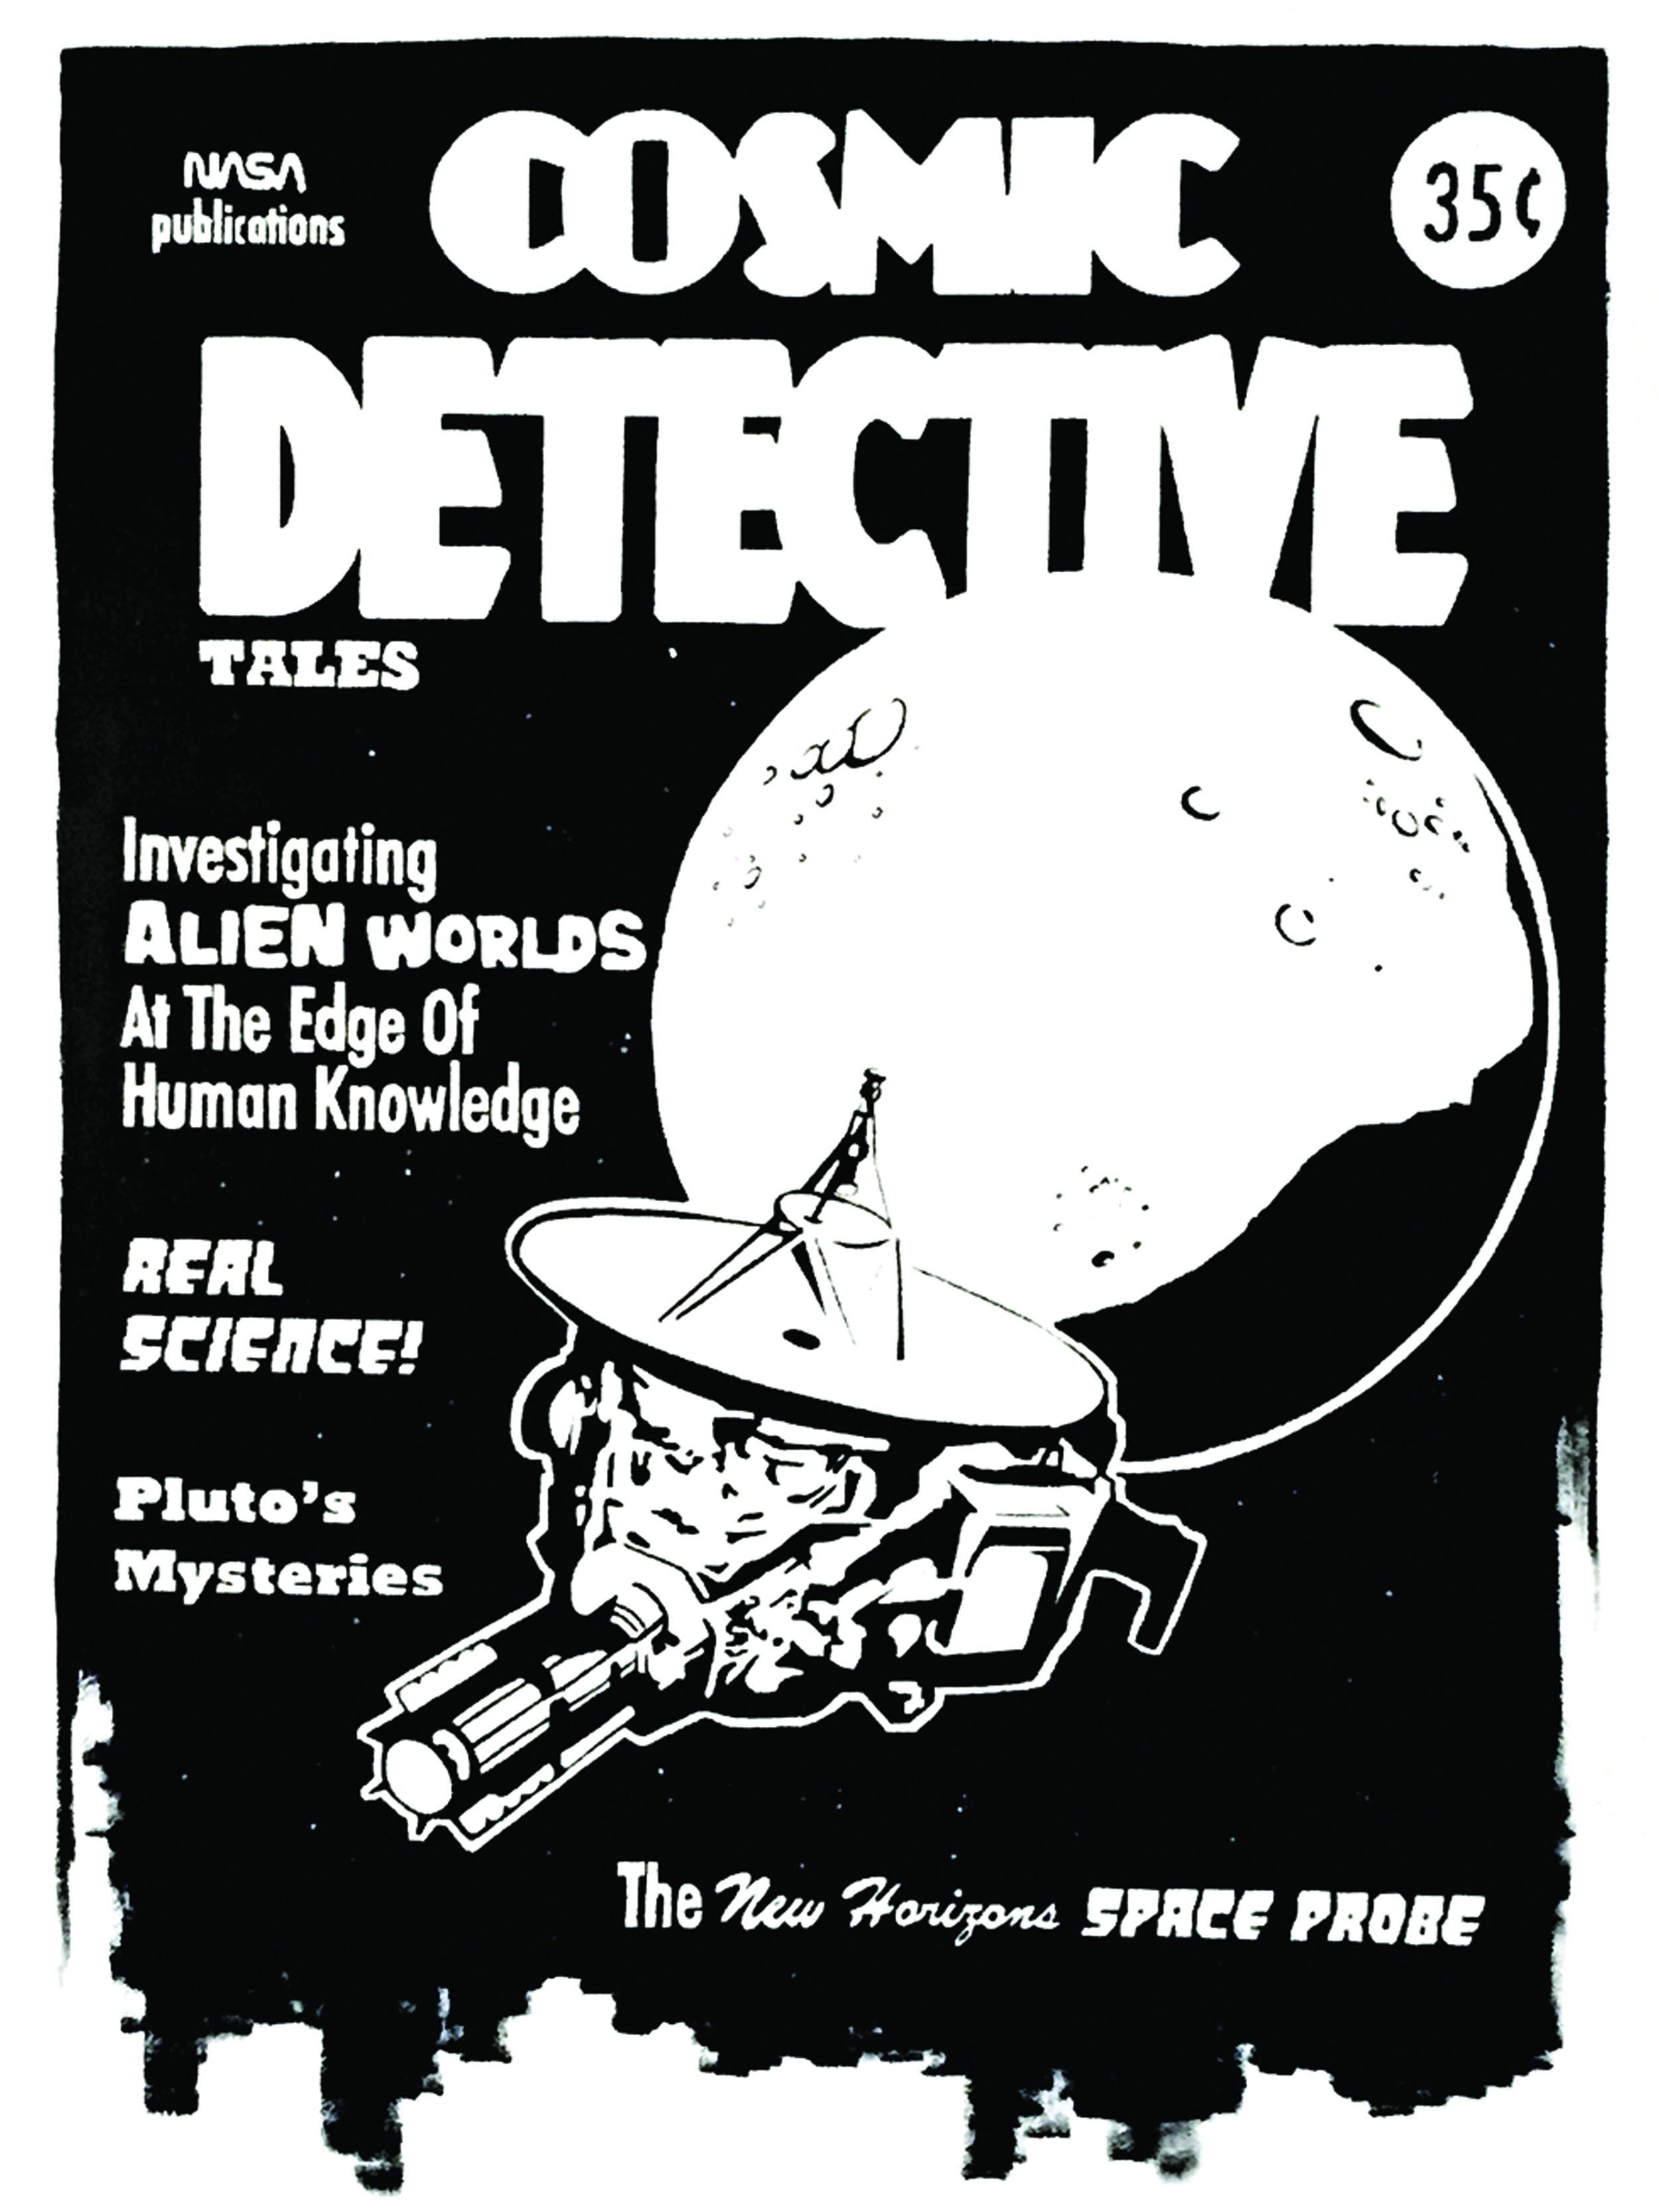 detective mural.jpg